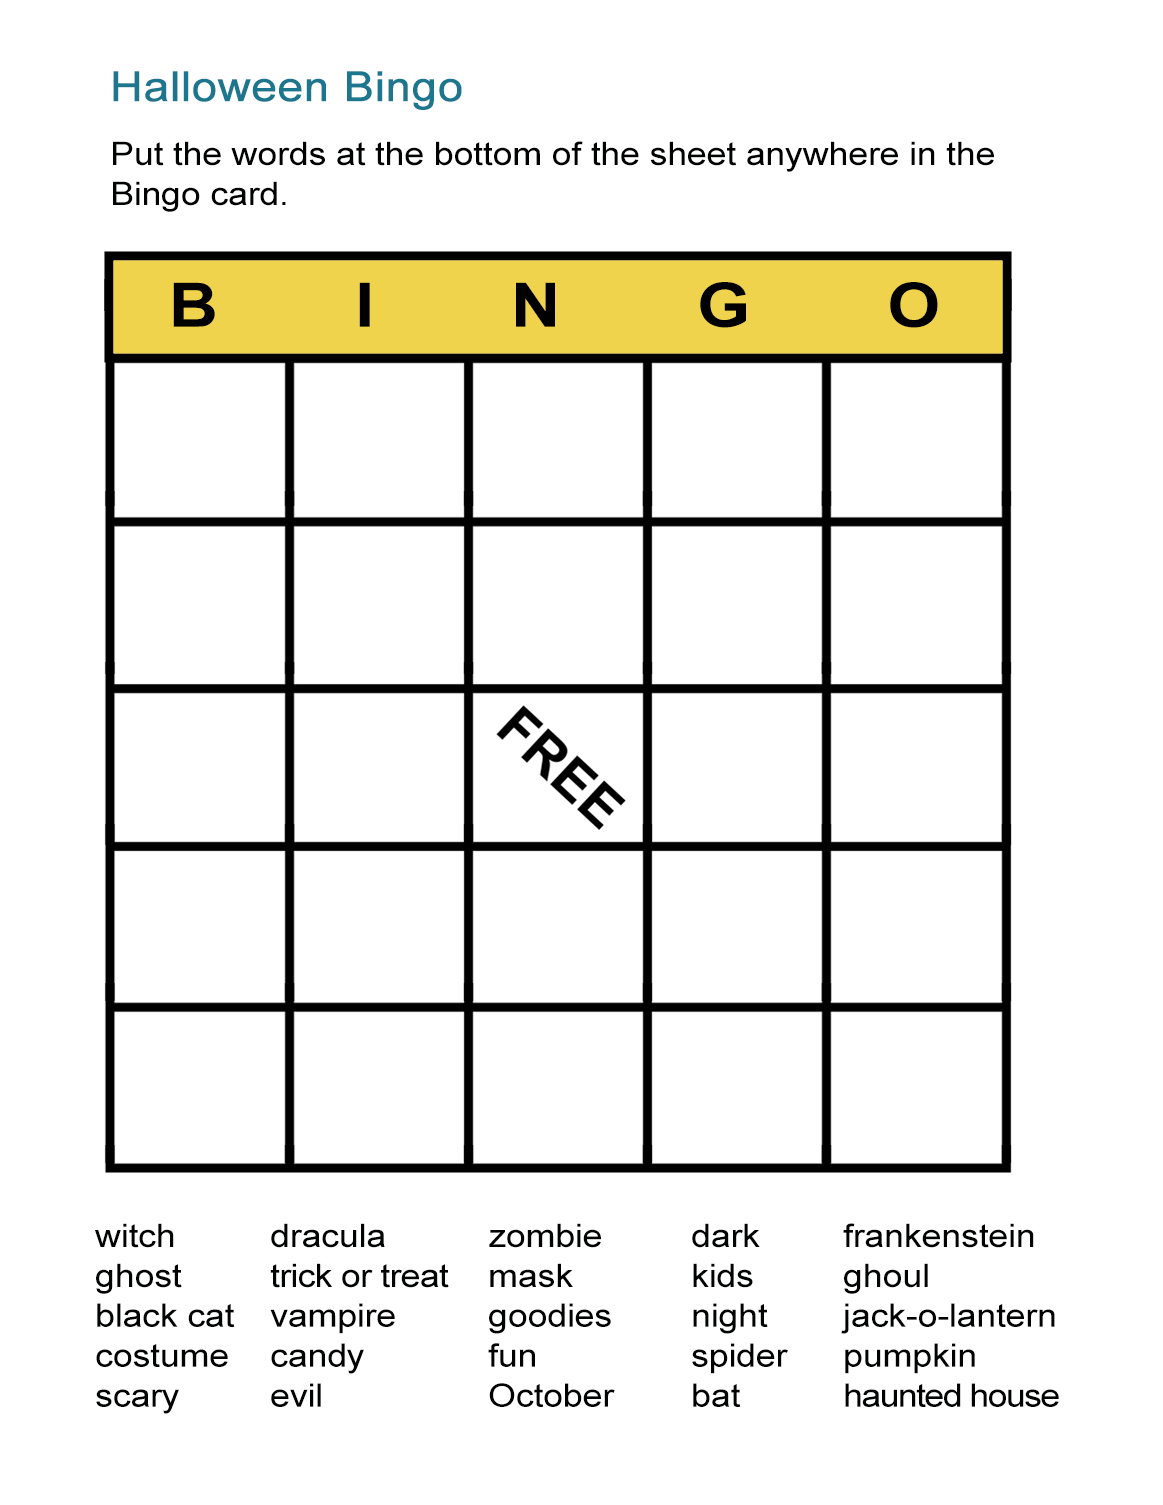 Halloween Bingo Cards: Printable Bingo Games For Class - All Esl - Free Printable Bingo Cards